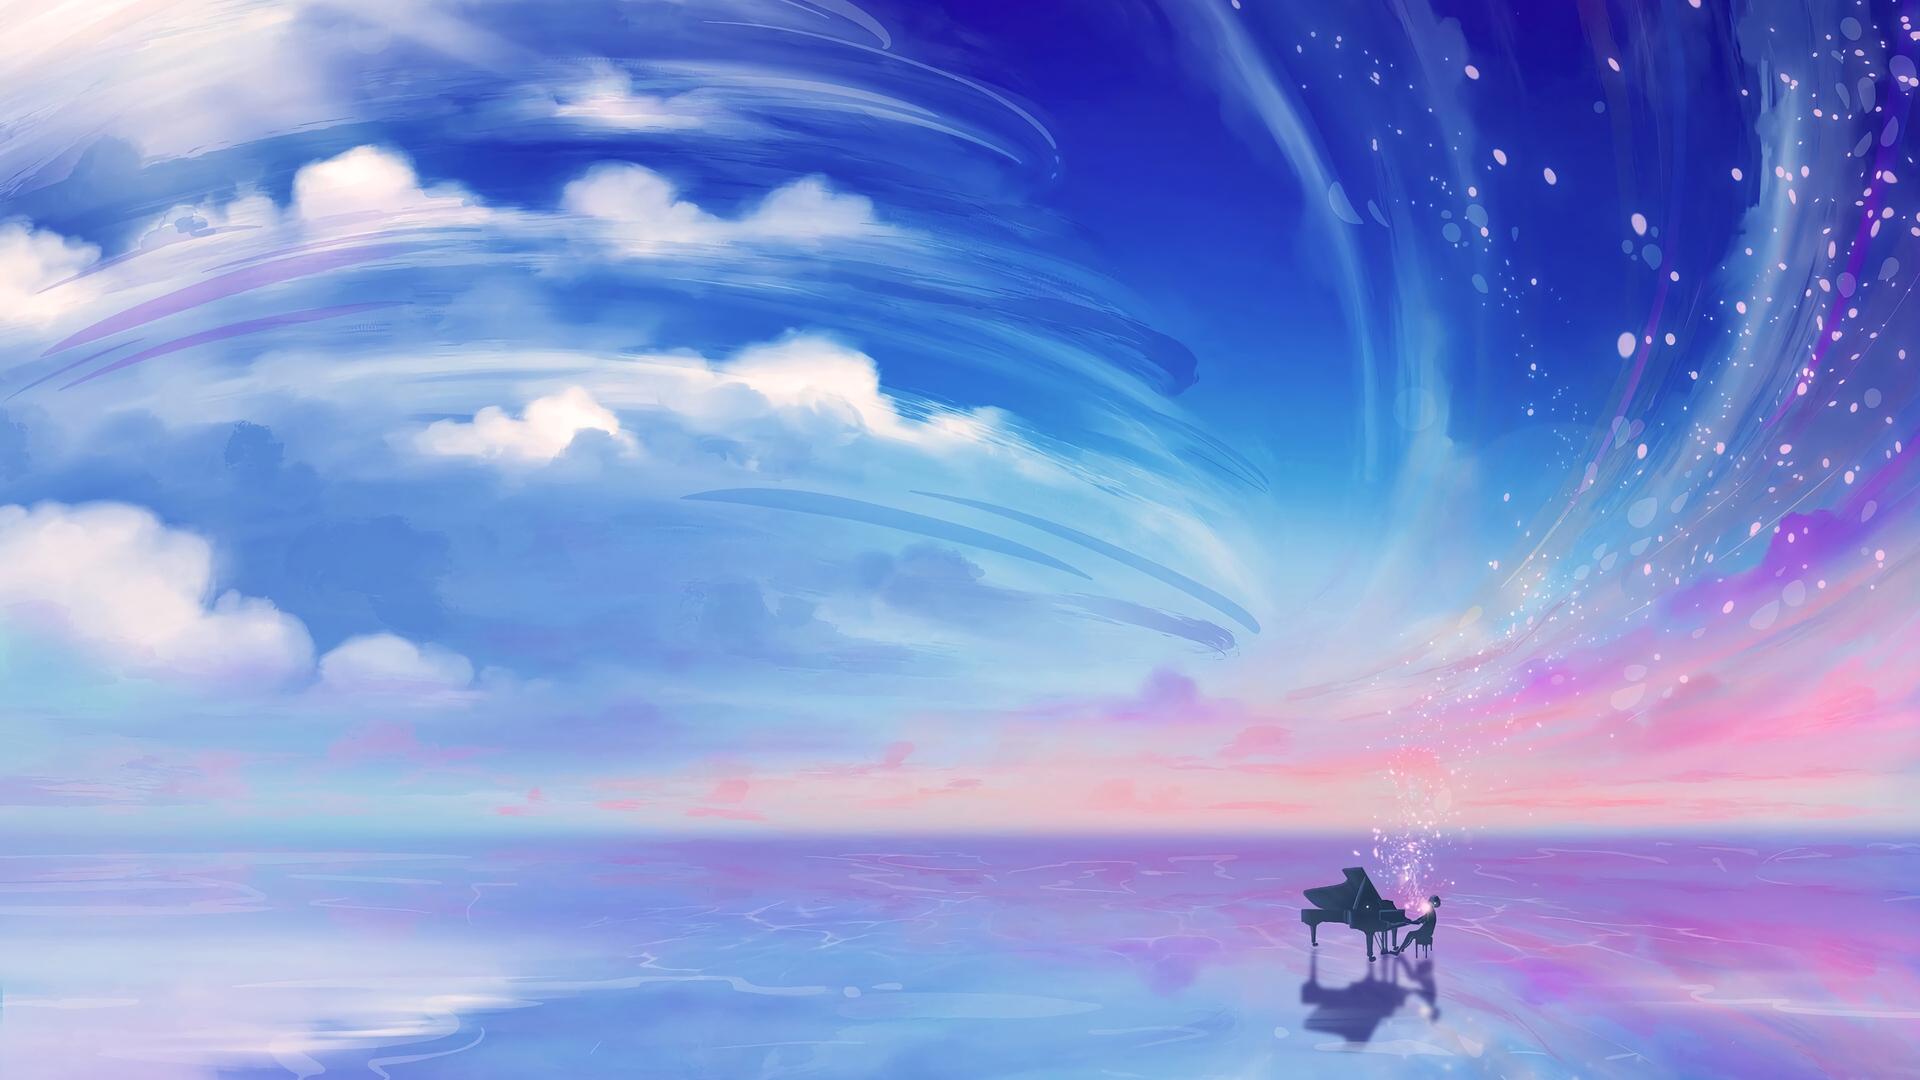 1920x1080 Anime Girl Playing Piano Laptop Full HD 1080P HD ...